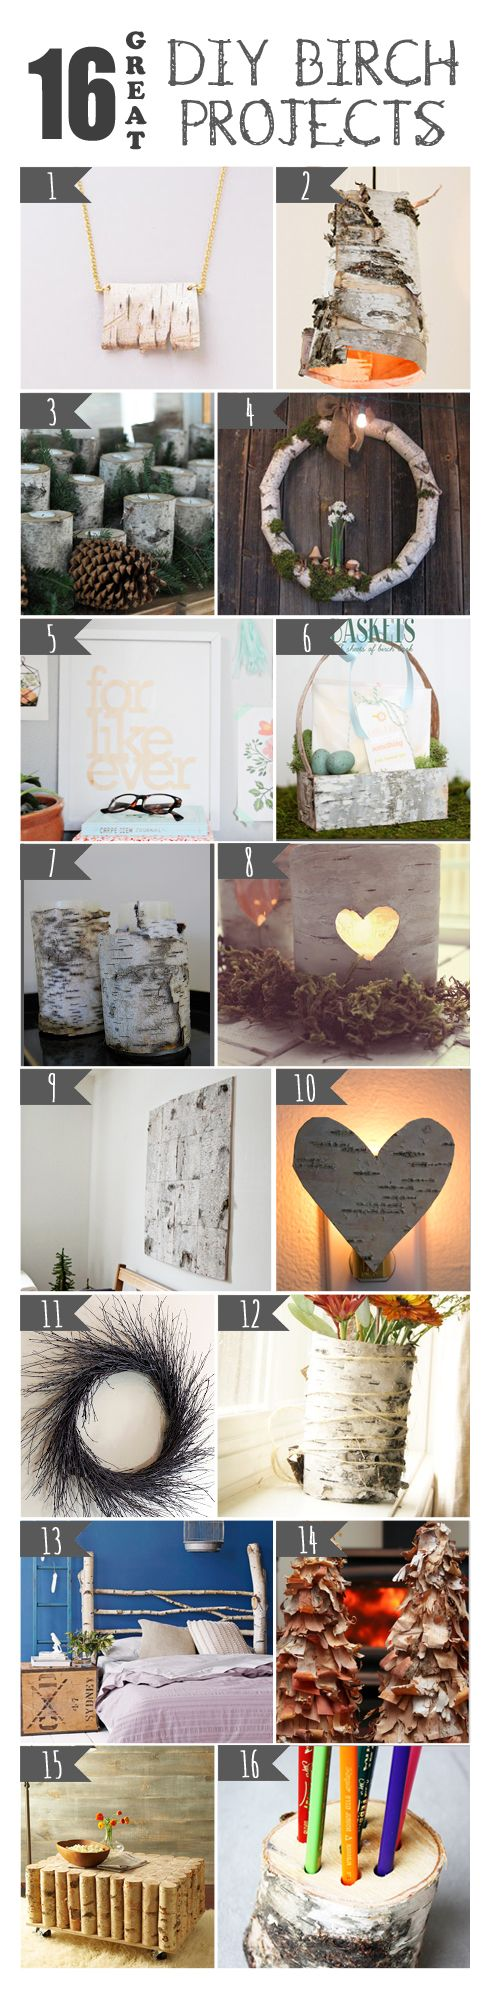 16 DIY Birch Projects